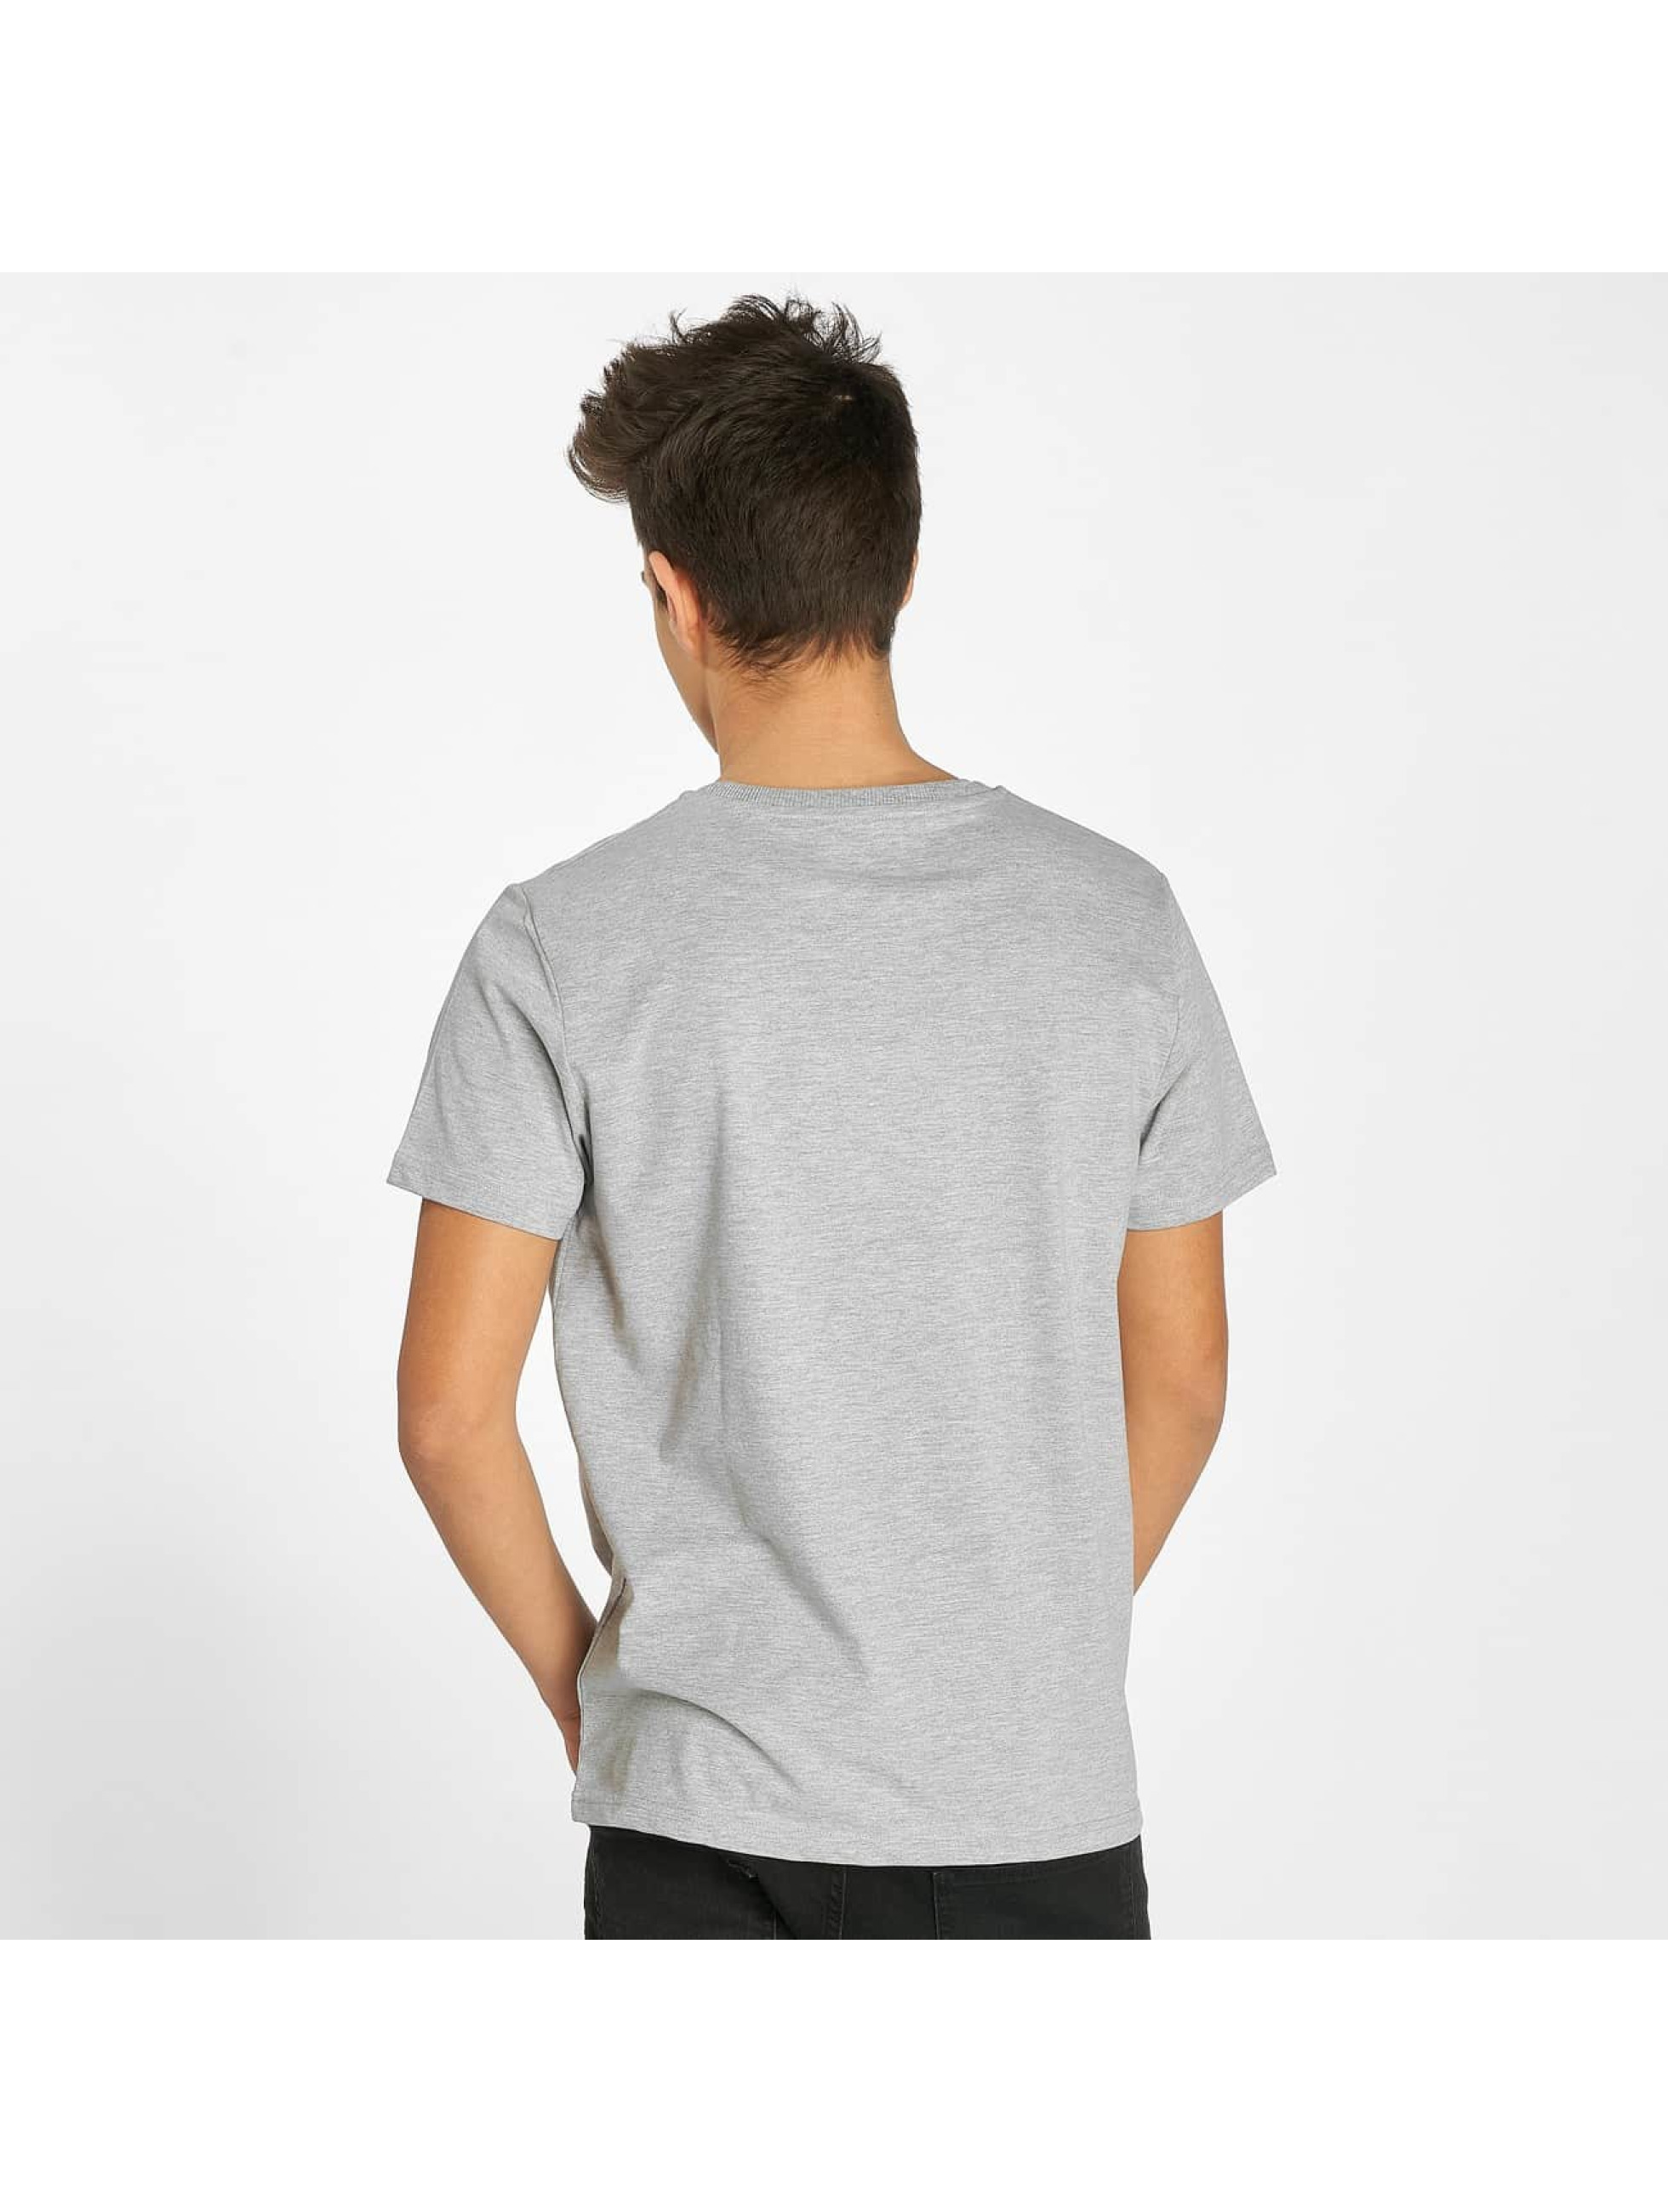 Kulte T-Shirt Corpo grau